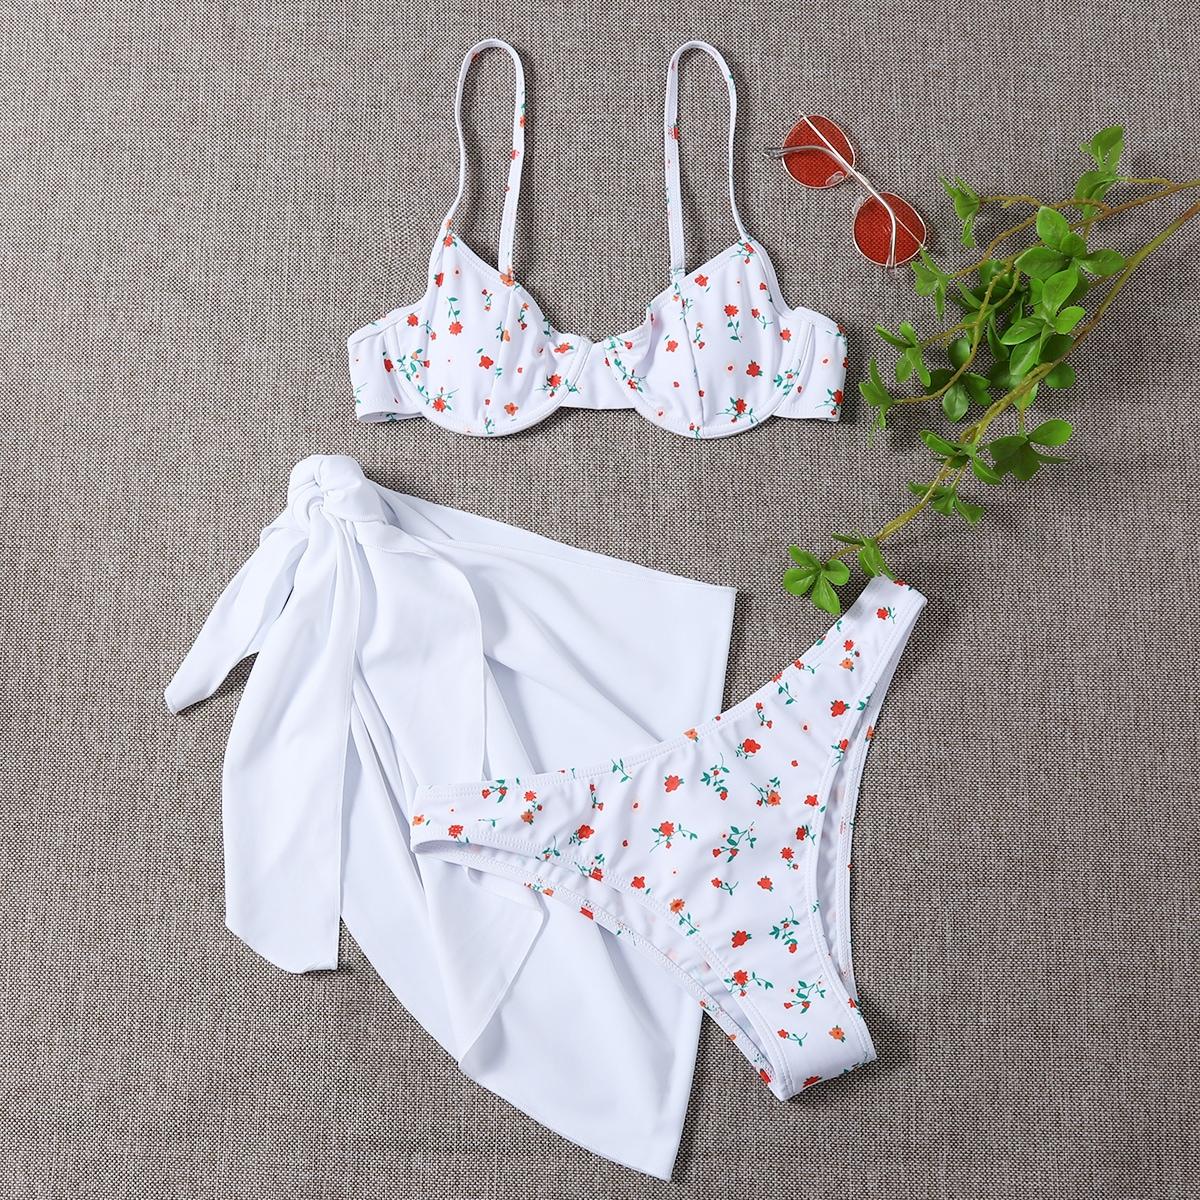 3 пакета бикини на косточках с принтом и пляжная юбка